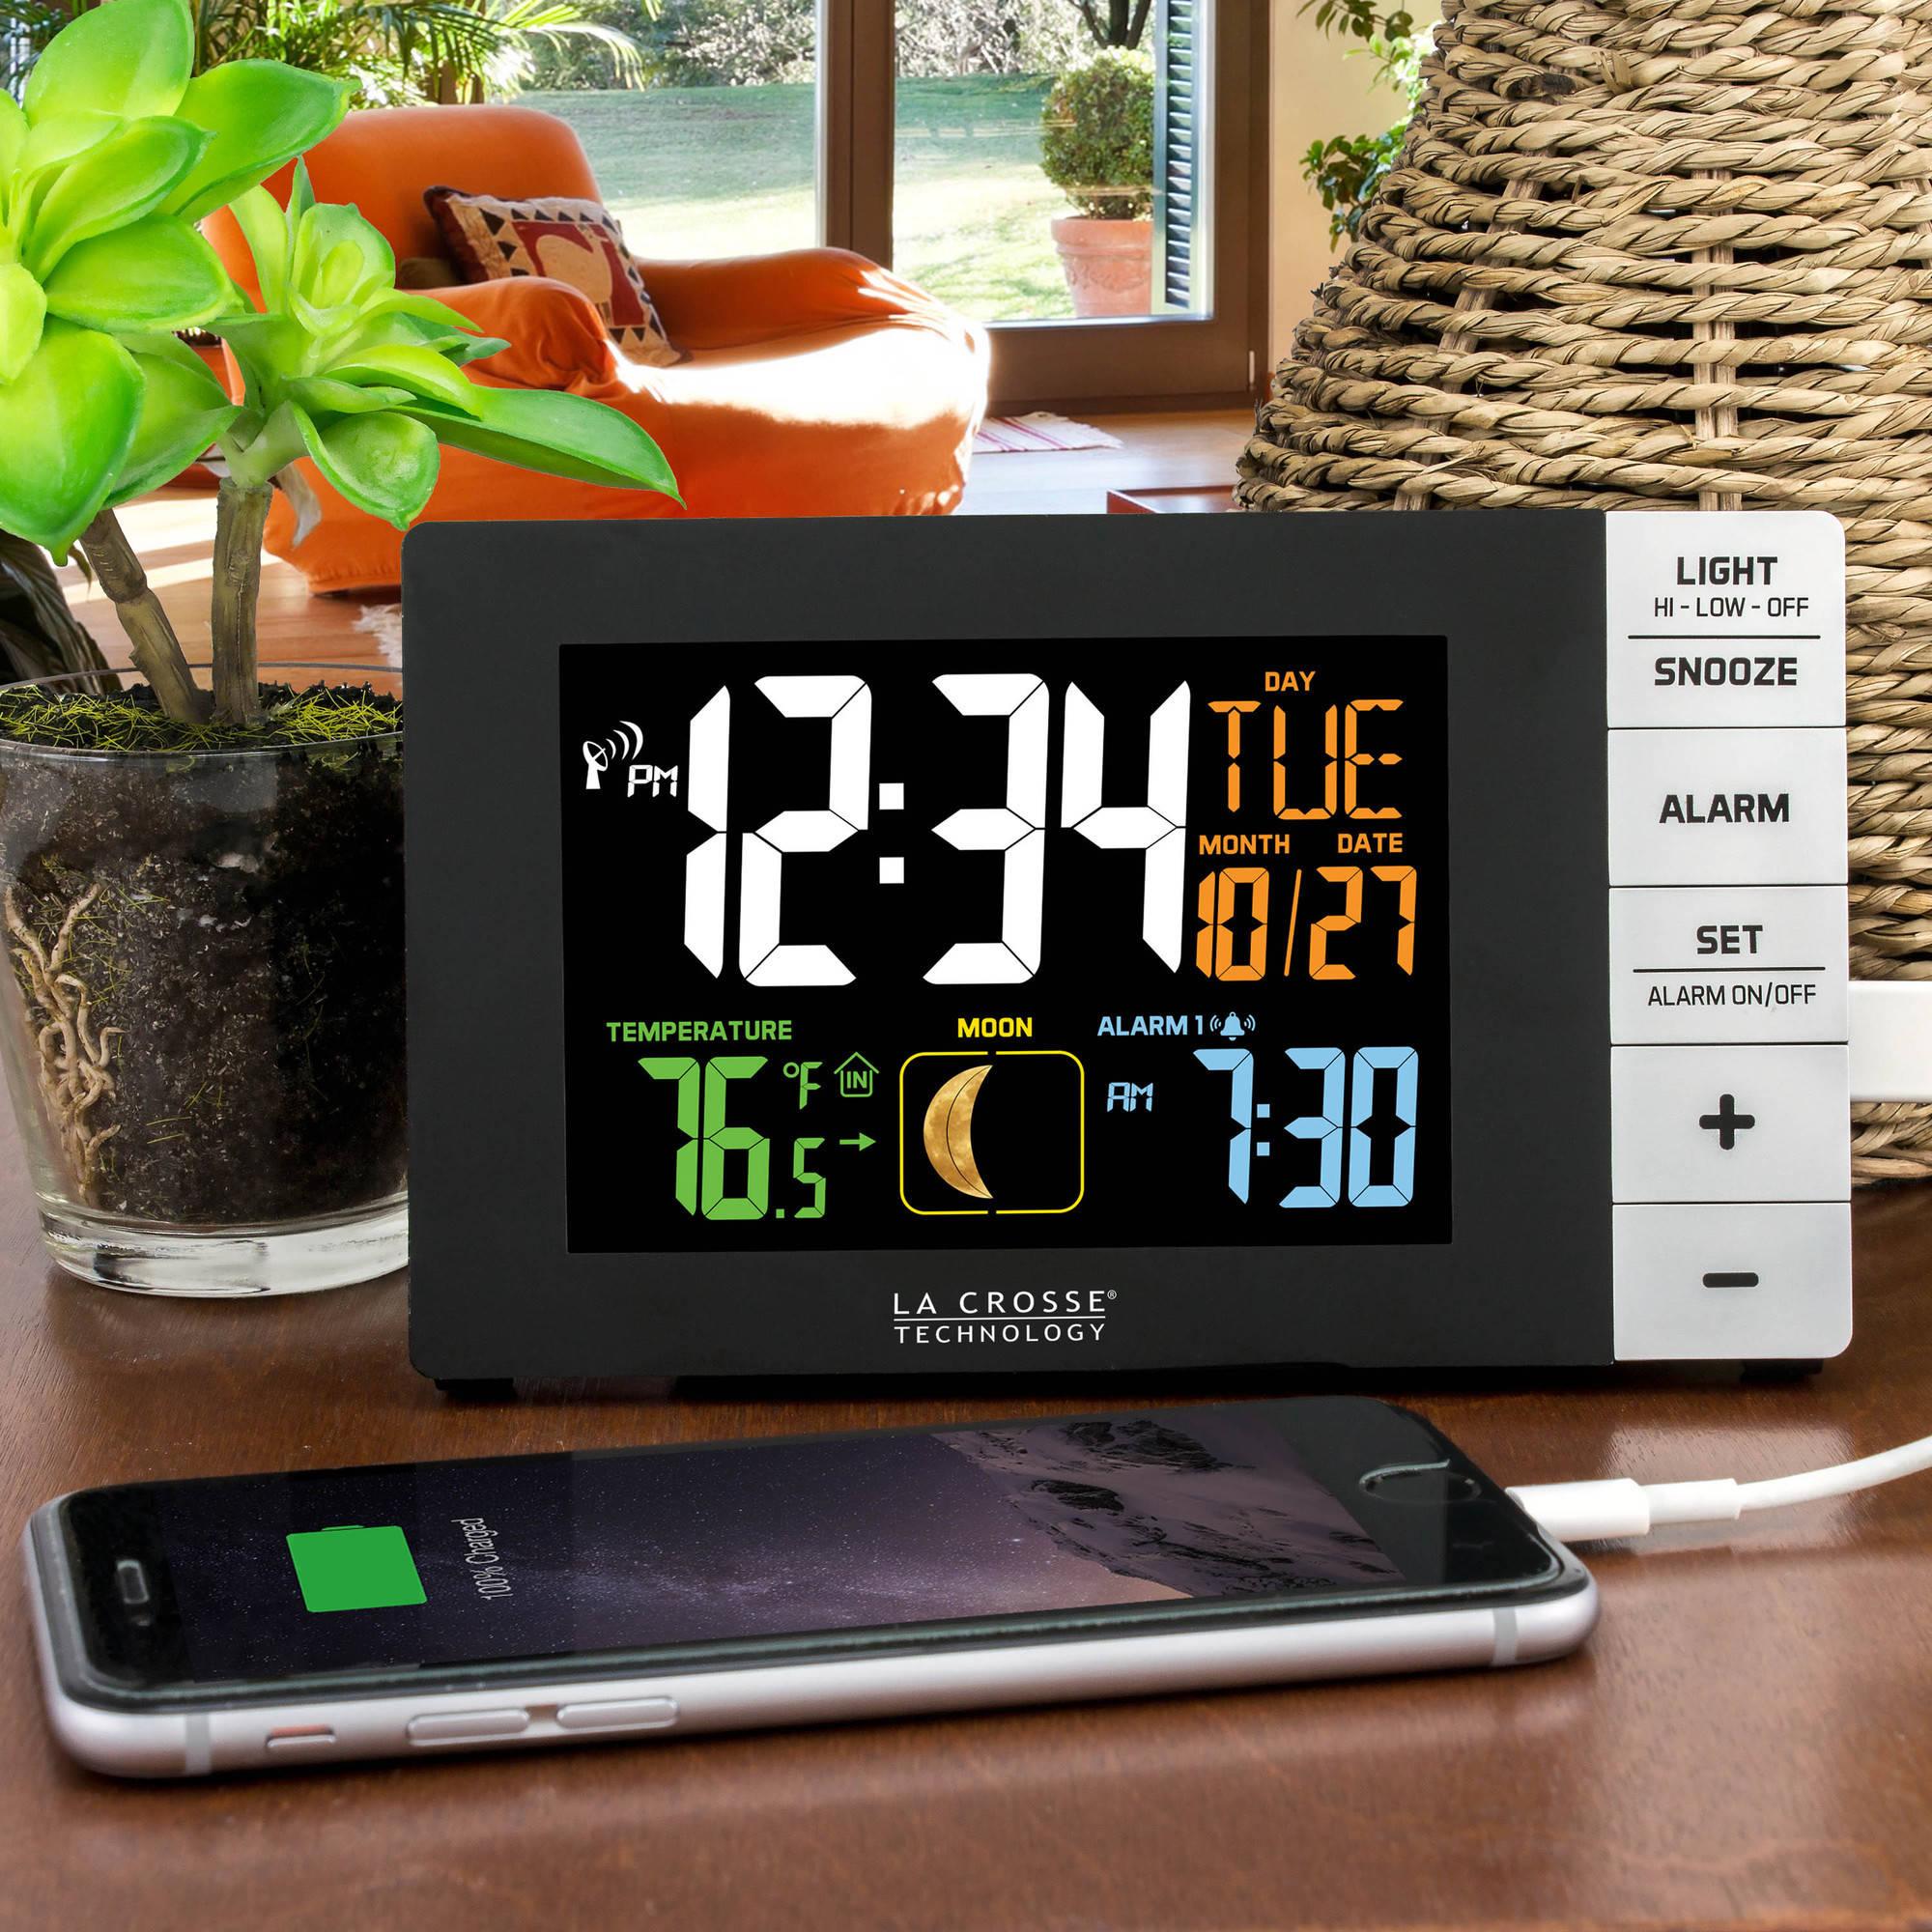 La crosse technology color alarm clock with indoor temperature and la crosse technology color alarm clock with indoor temperature and usb port walmart amipublicfo Gallery